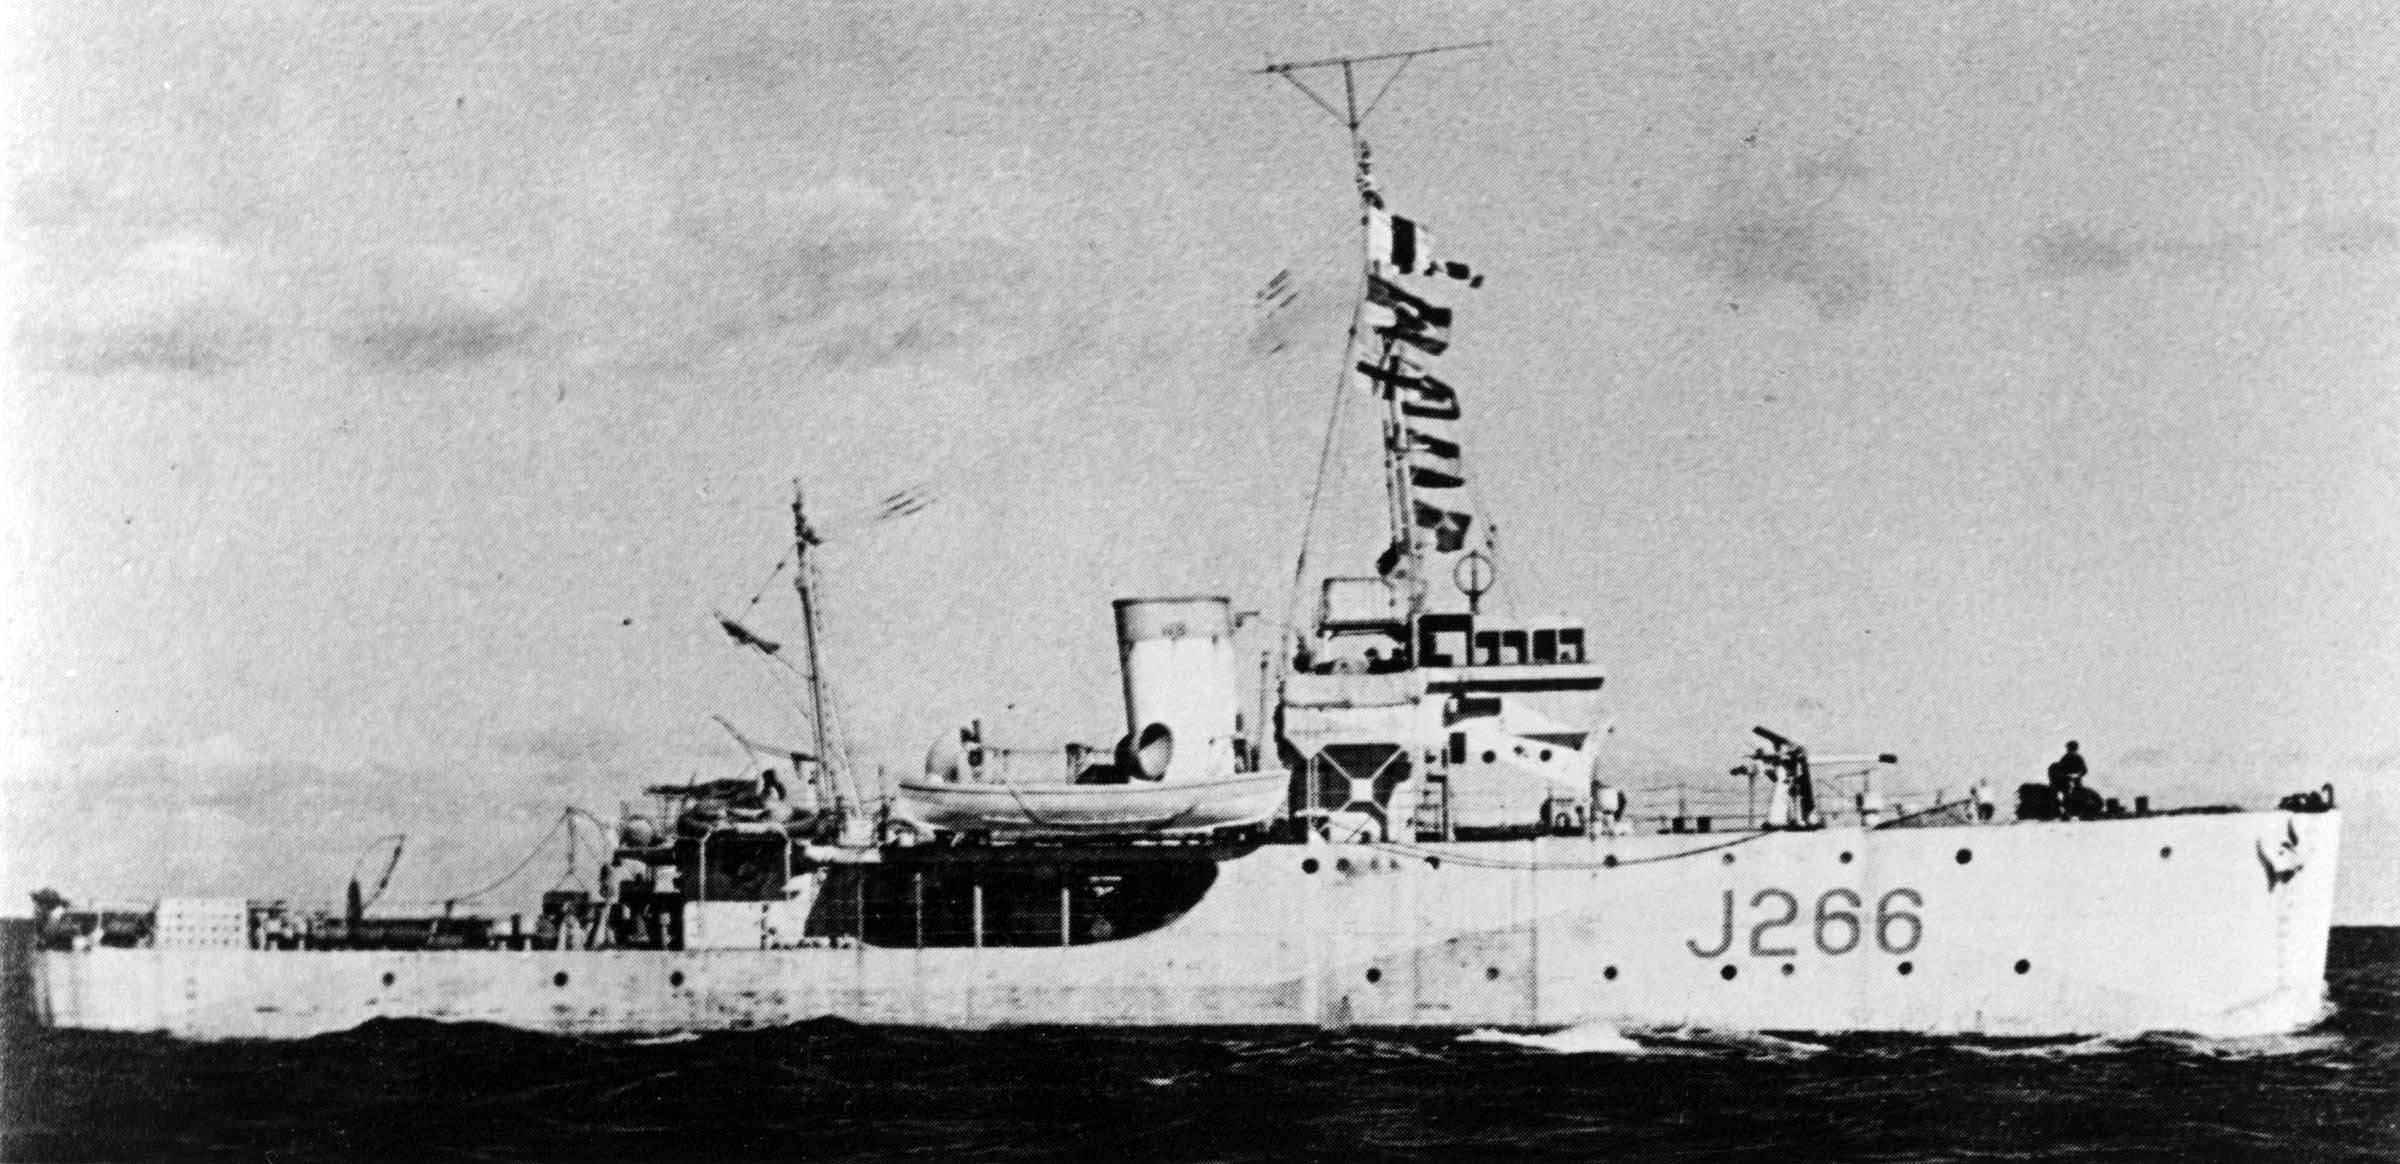 HMCS LACHINE